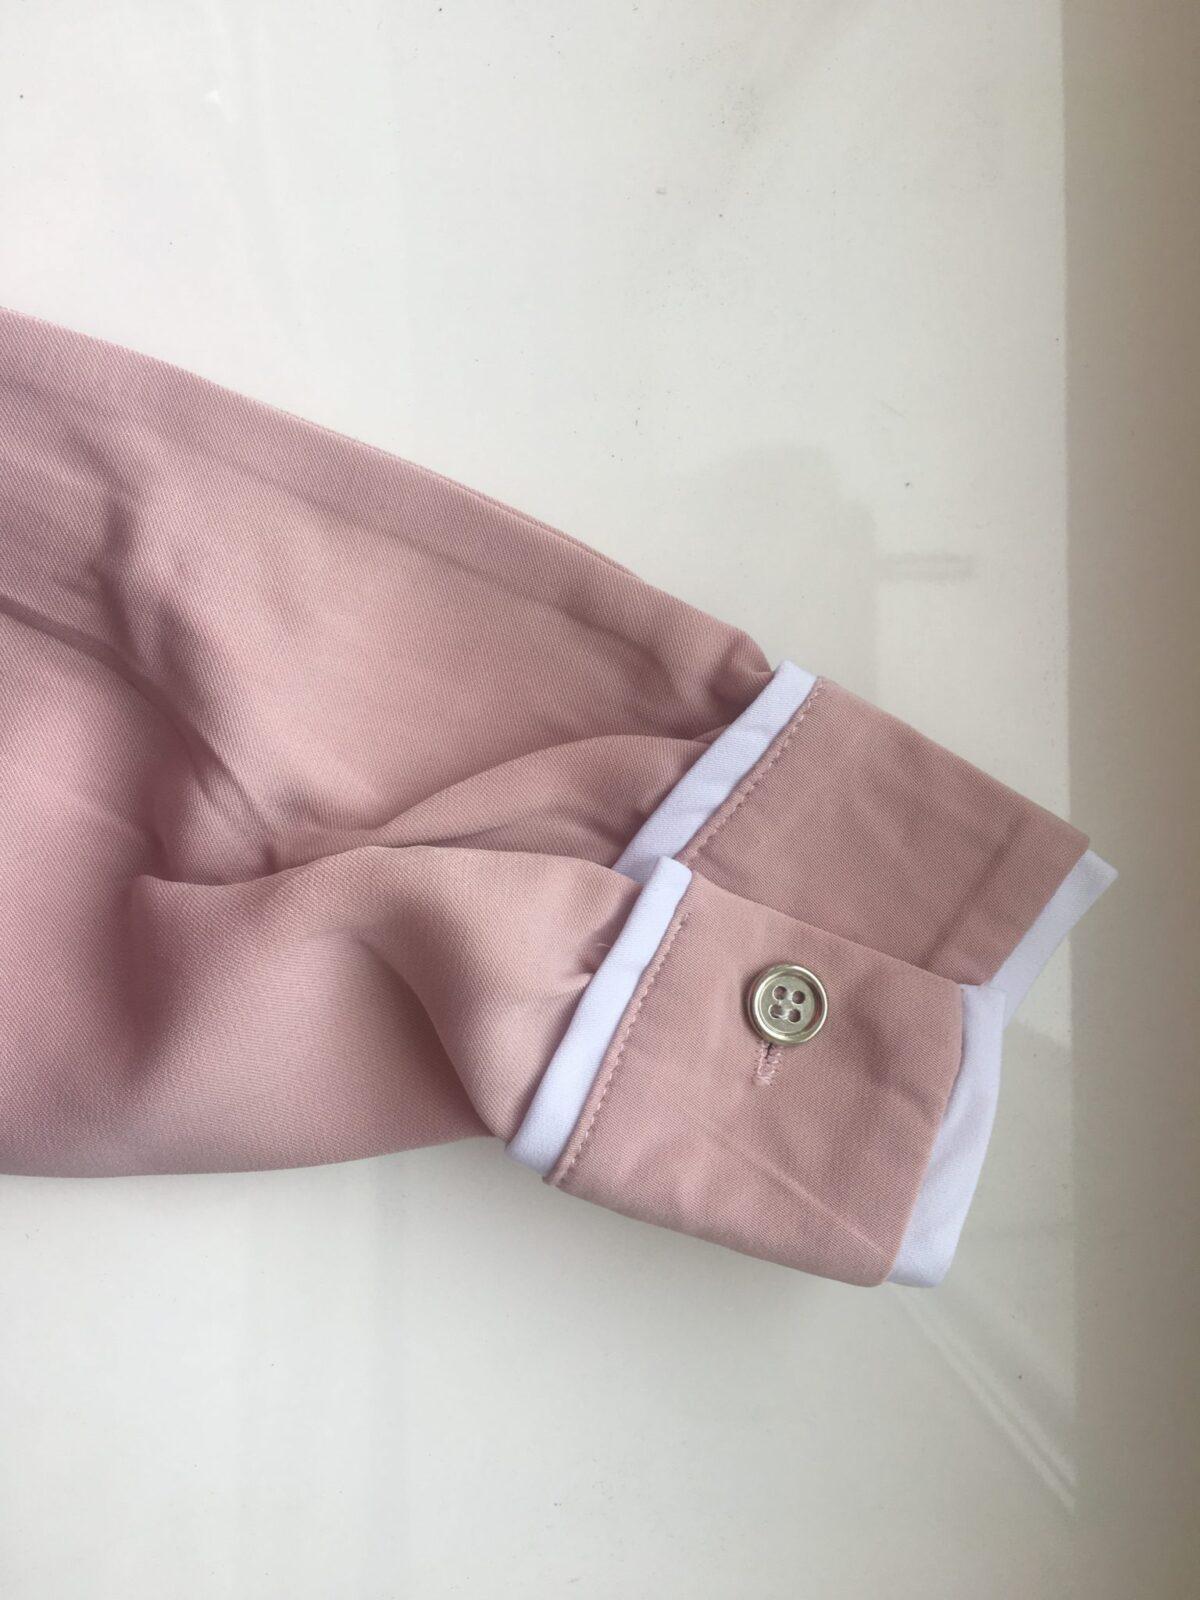 Блузка С Бантом Фото В Волгограде